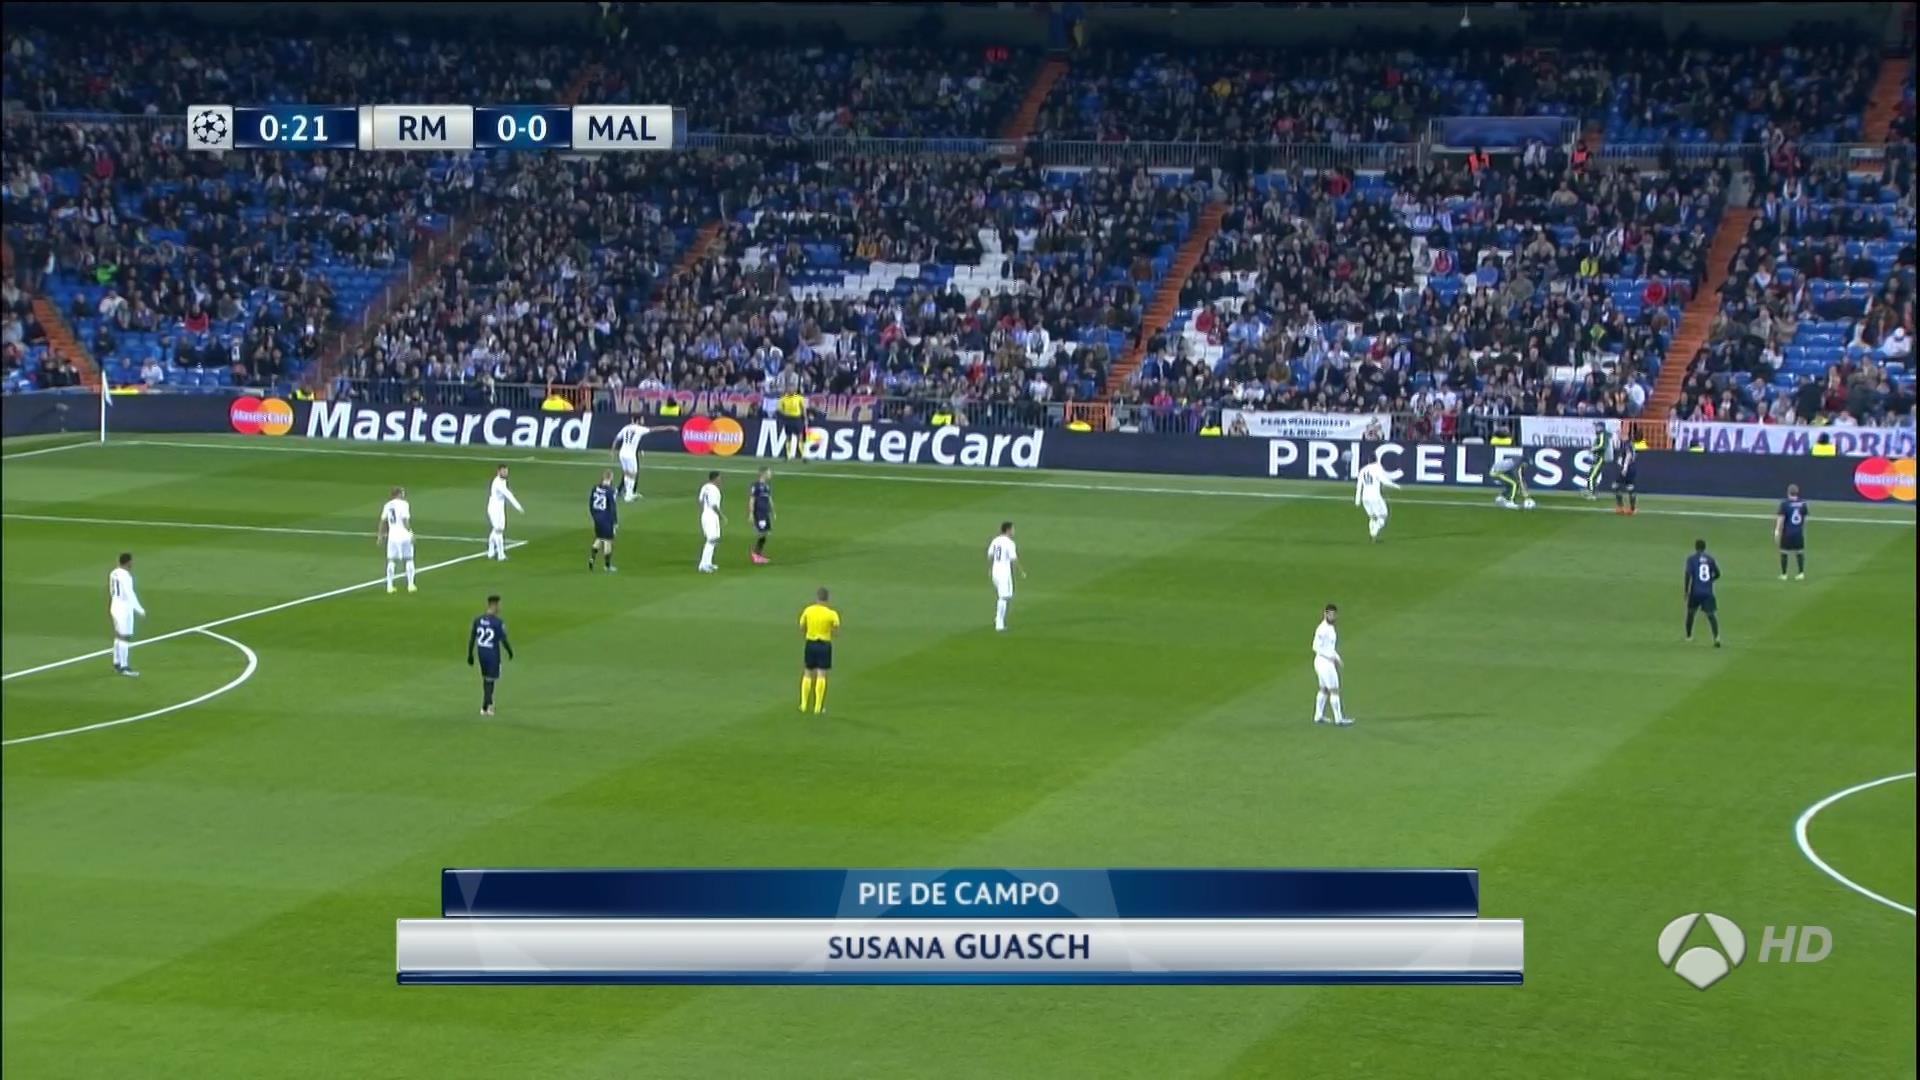 FUTBOL : UCL 2015/16 Gr.A J6 - Real Madrid v. Malmo 08/12/2015 - photo#39